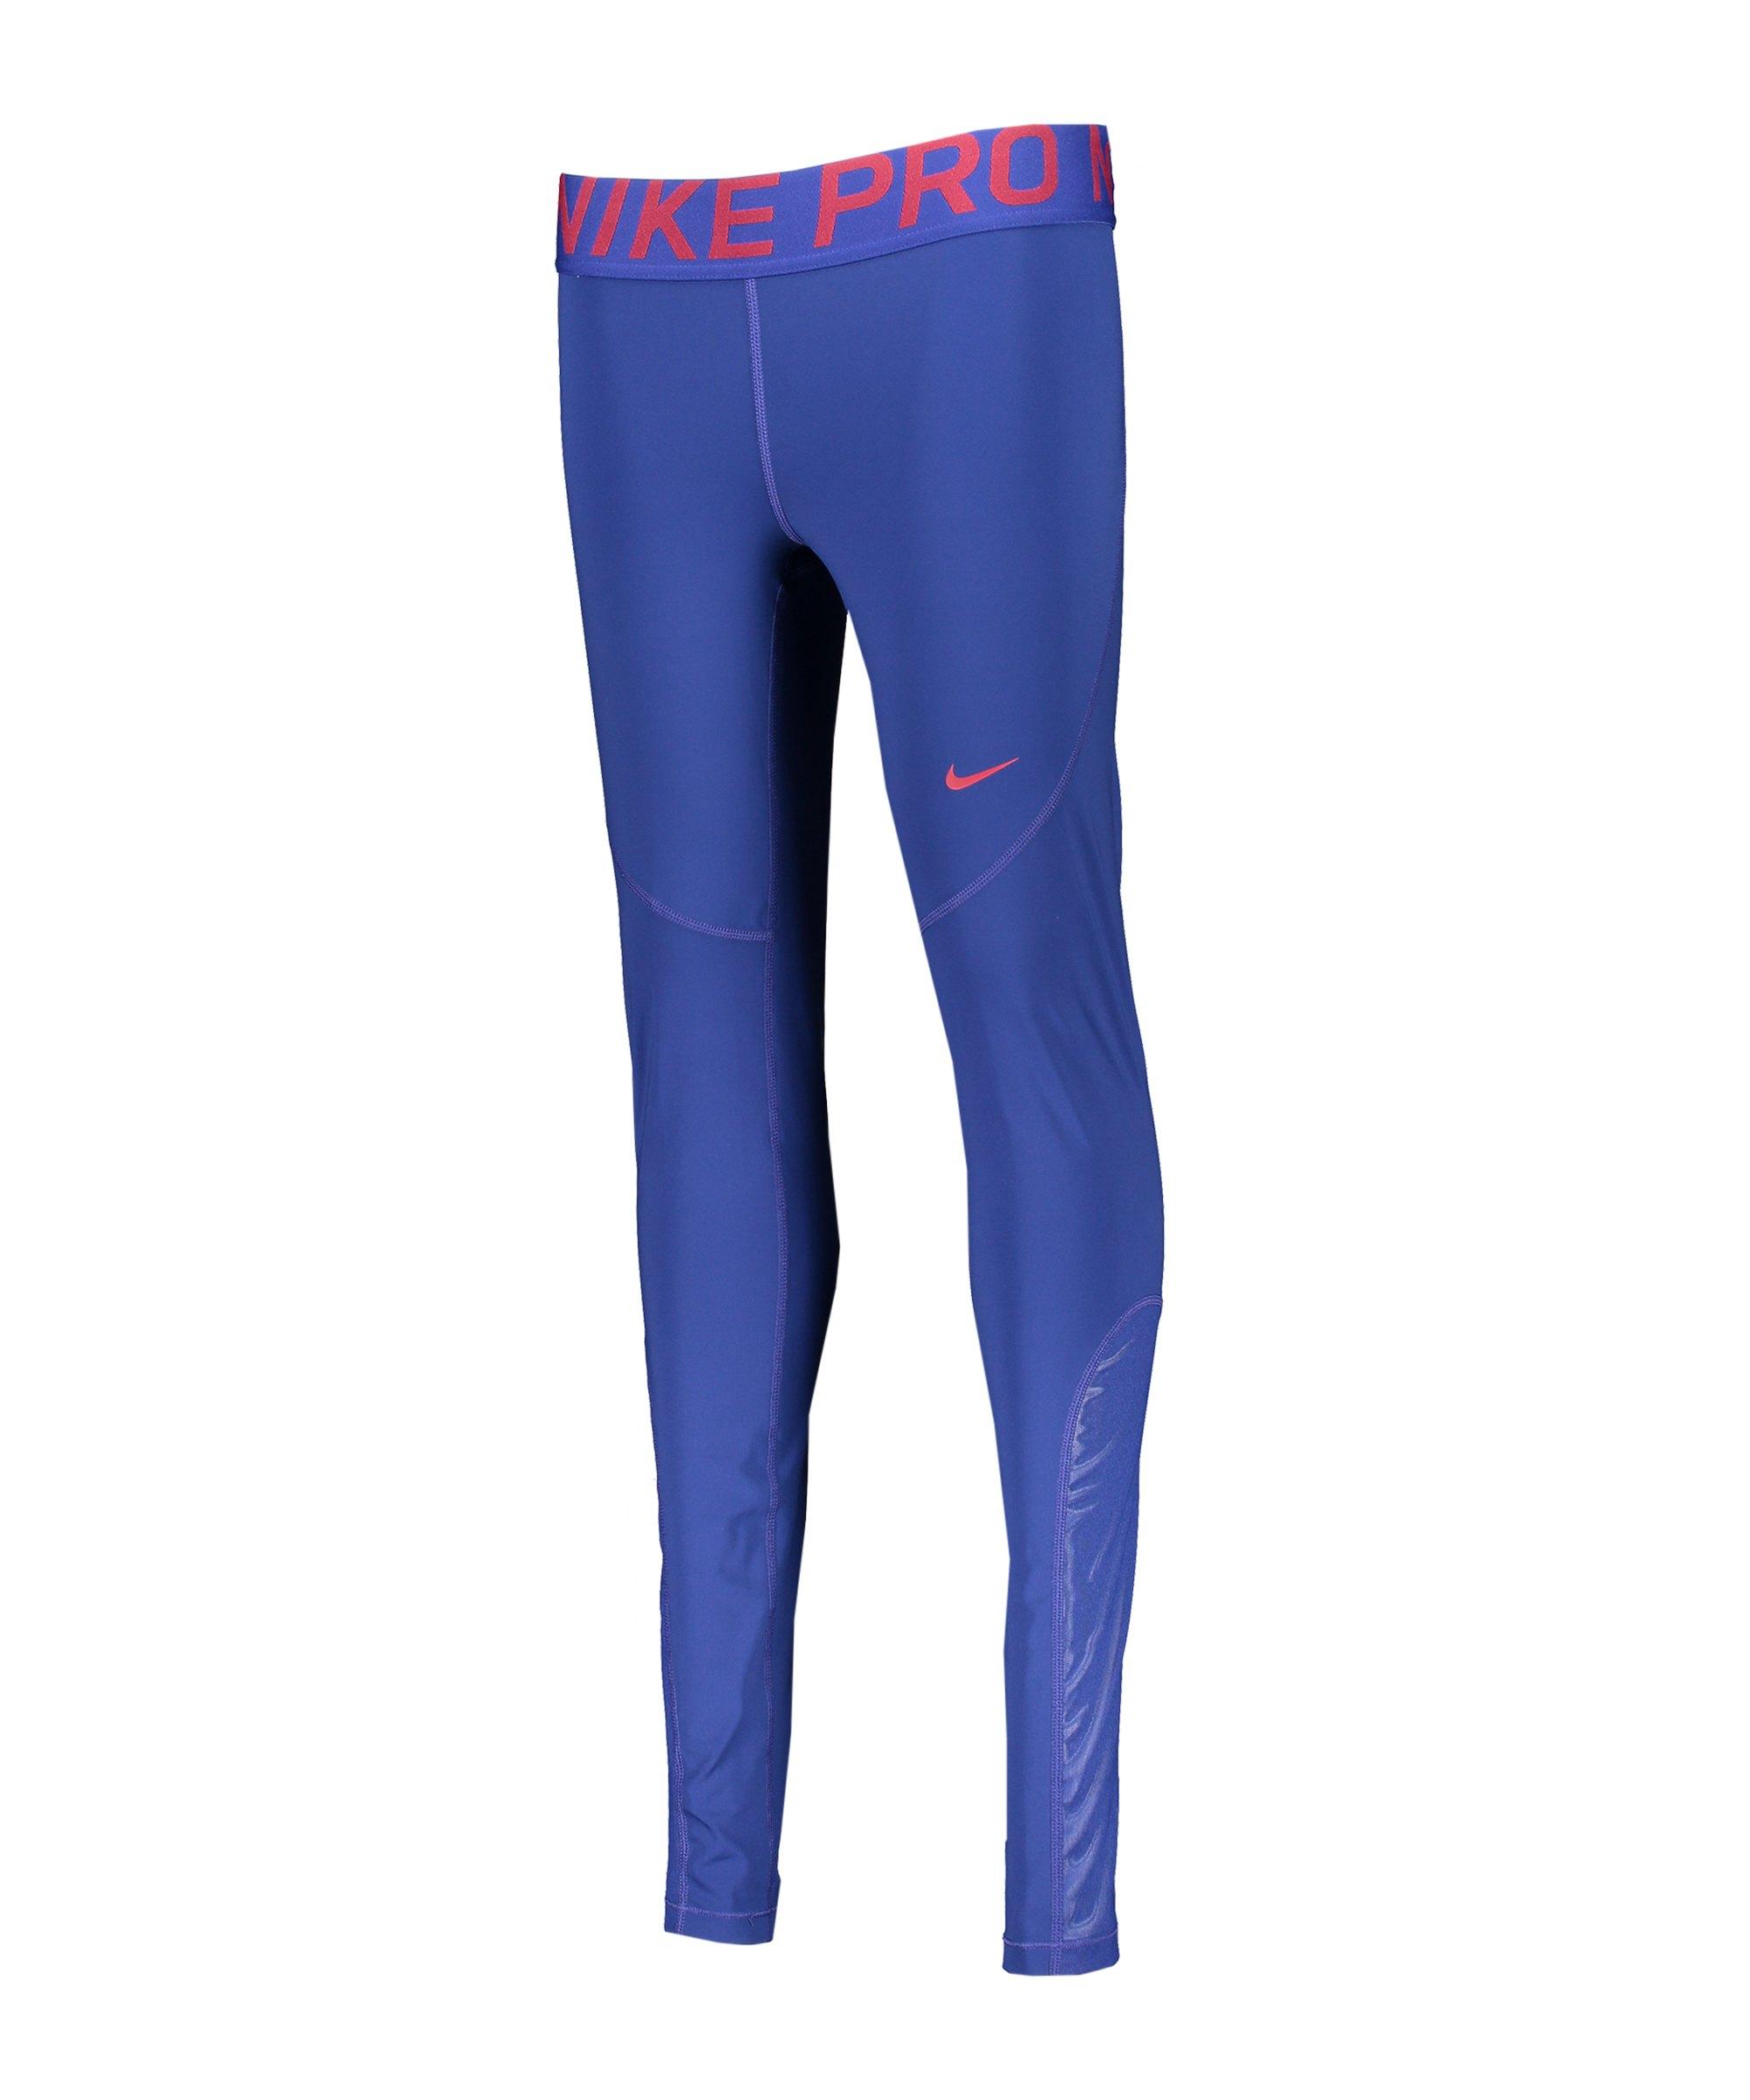 Nike Pro Tights Leggings Damen Blau Rot F455 - blau